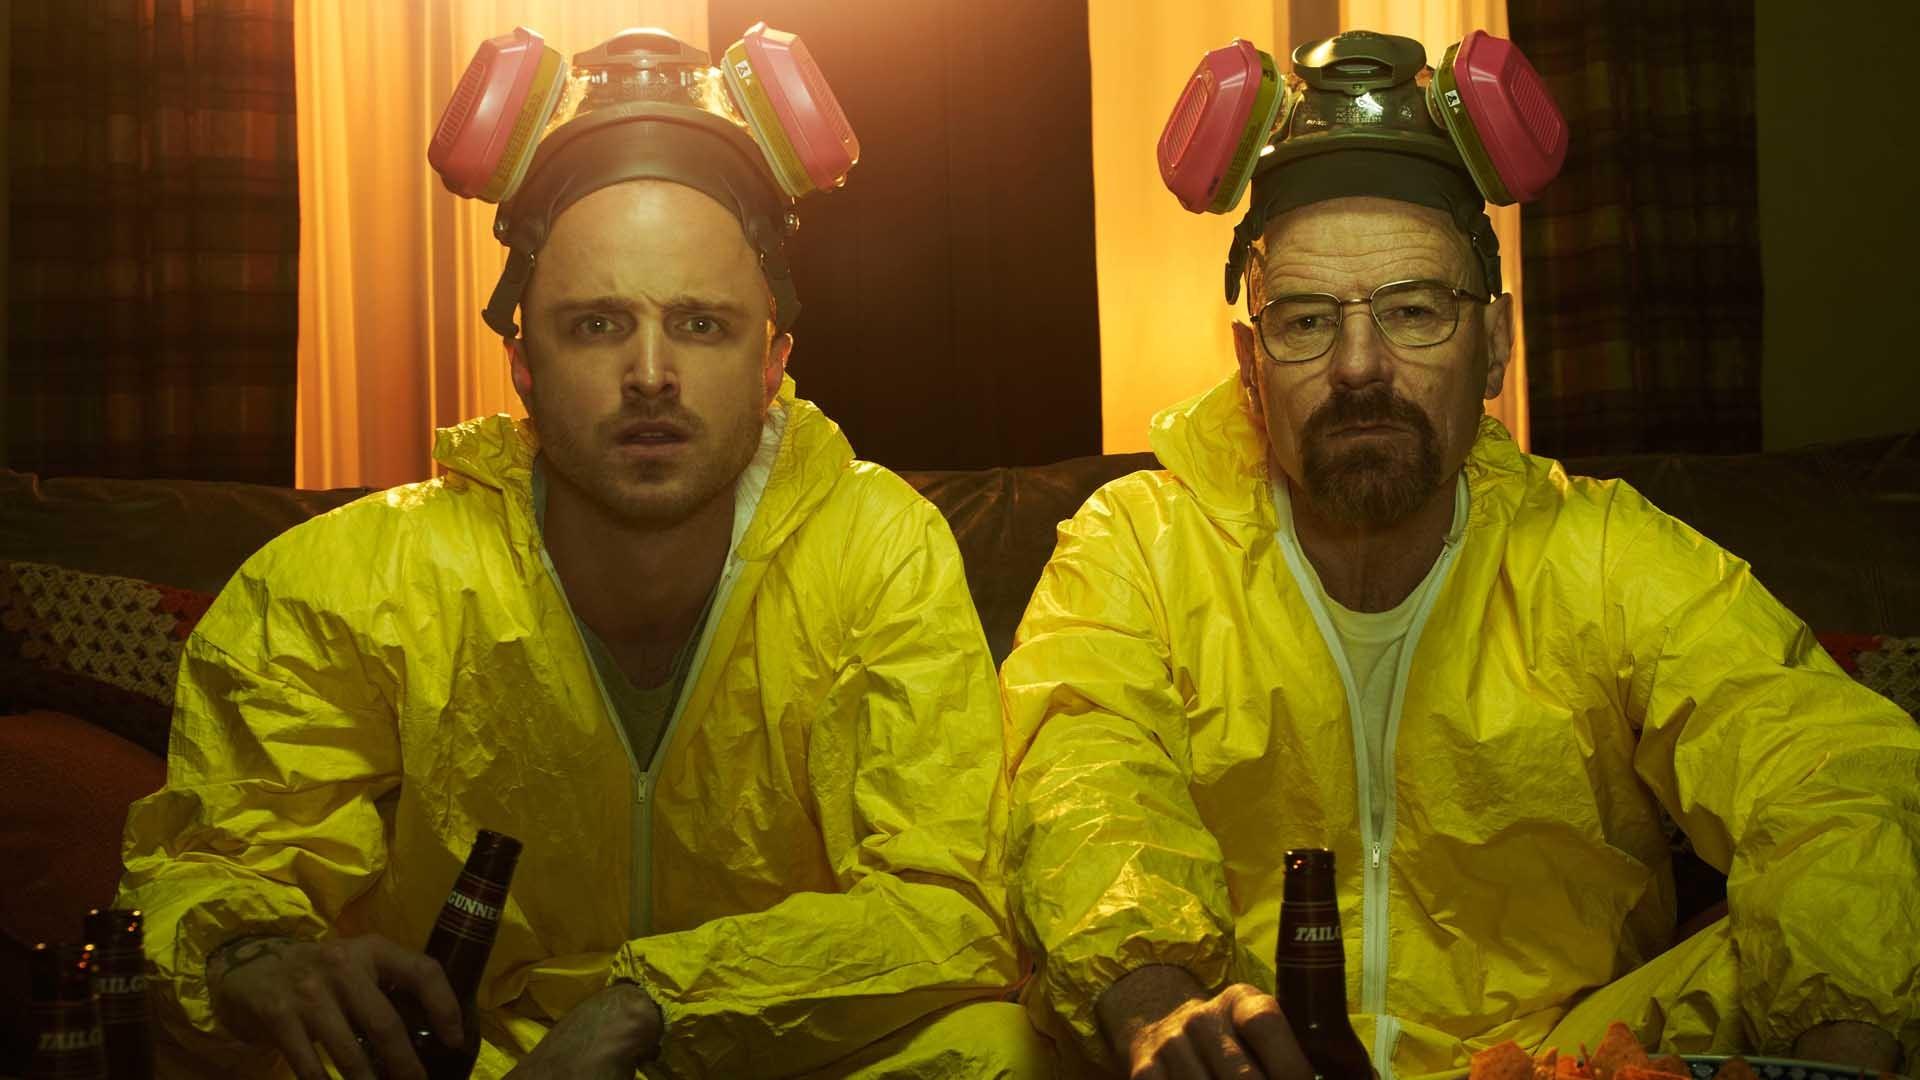 Aaron Paul e Bryan Cranston em 'Breaking Bad' (Foto: Divulgação )